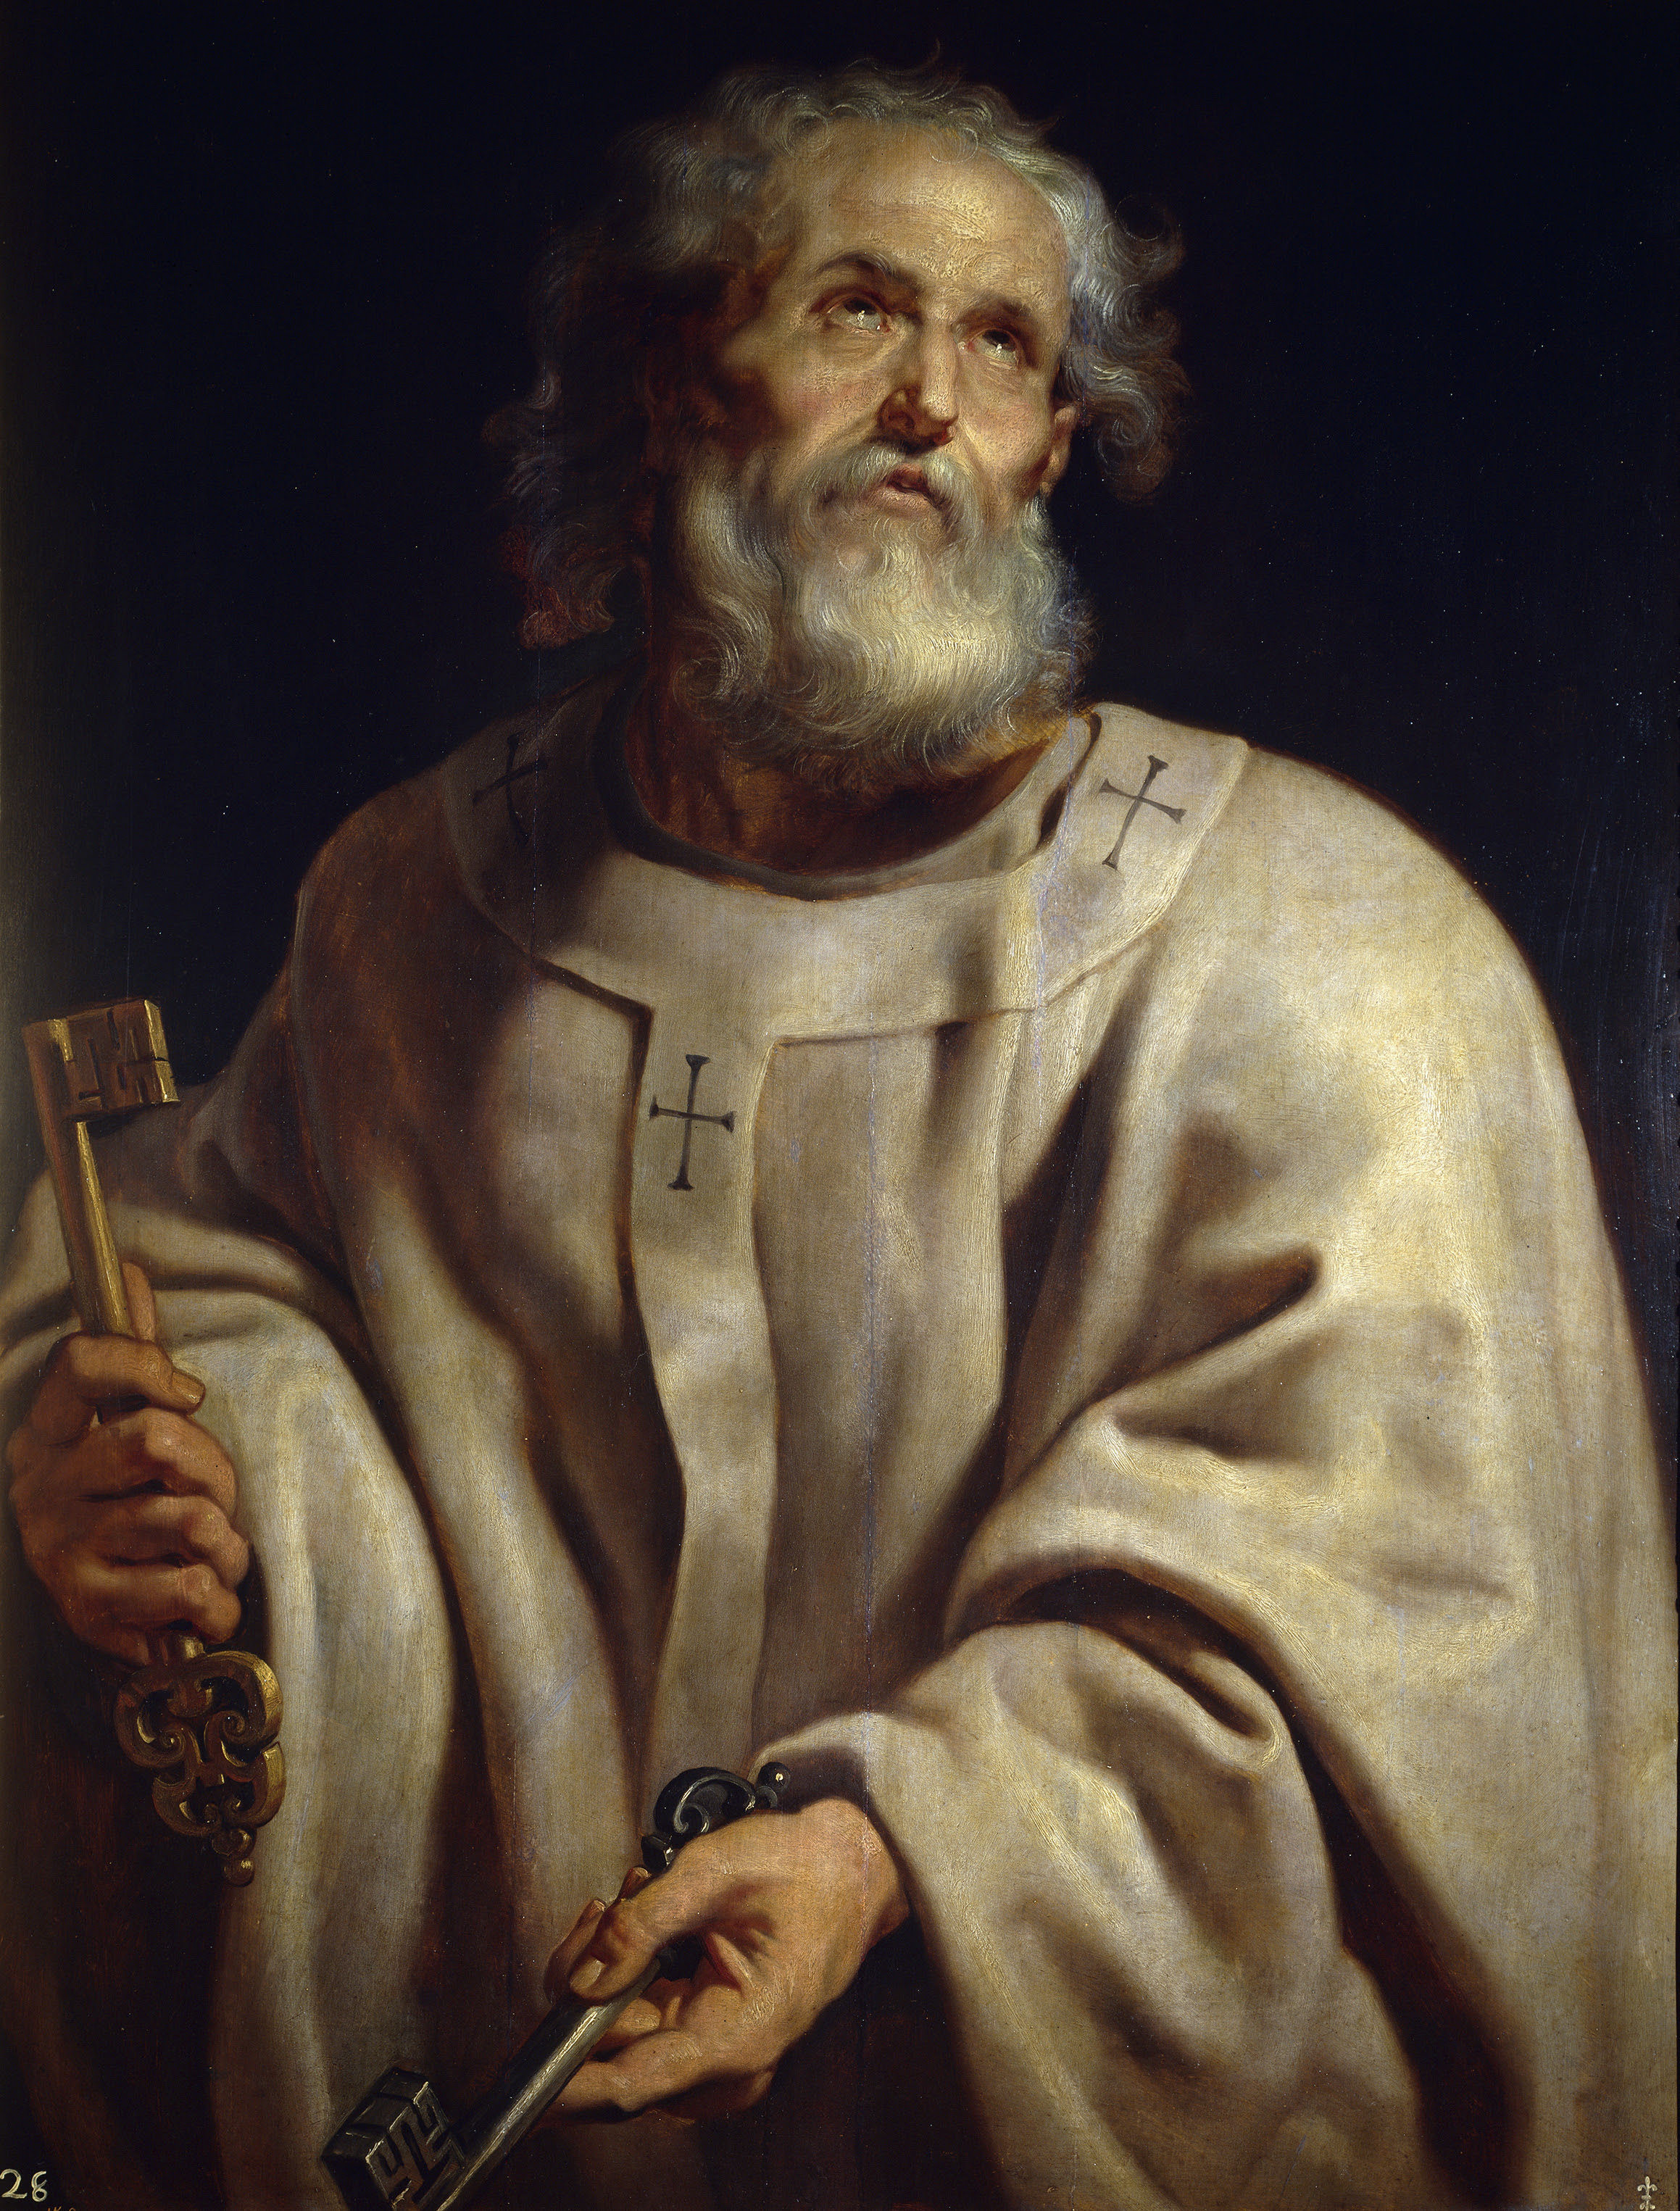 http://upload.wikimedia.org/wikipedia/commons/2/2d/Pope-peter_pprubens.jpg